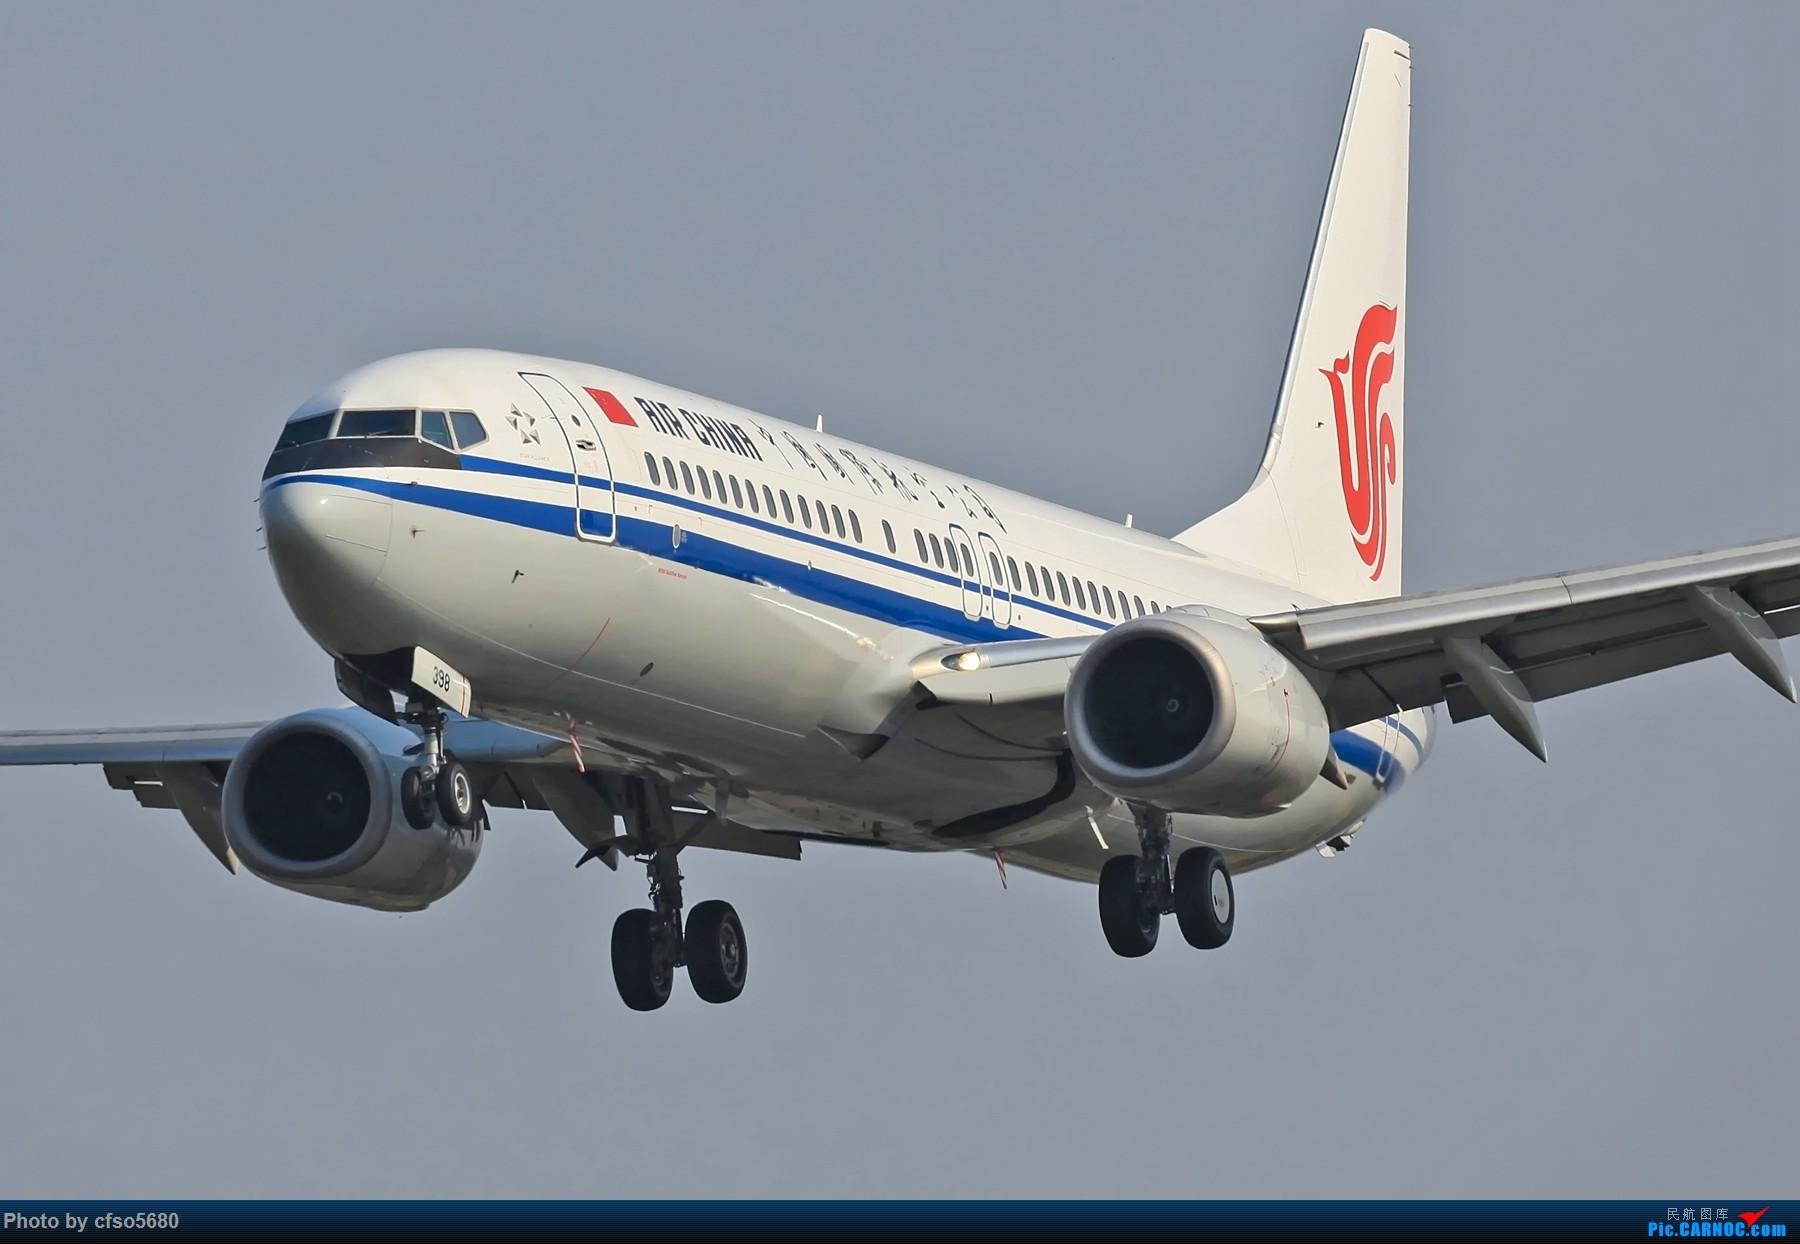 Re:[原创]国庆假期合肥新桥机场拍机活动 BOEING 737-800 B-5398 中国合肥新桥国际机场